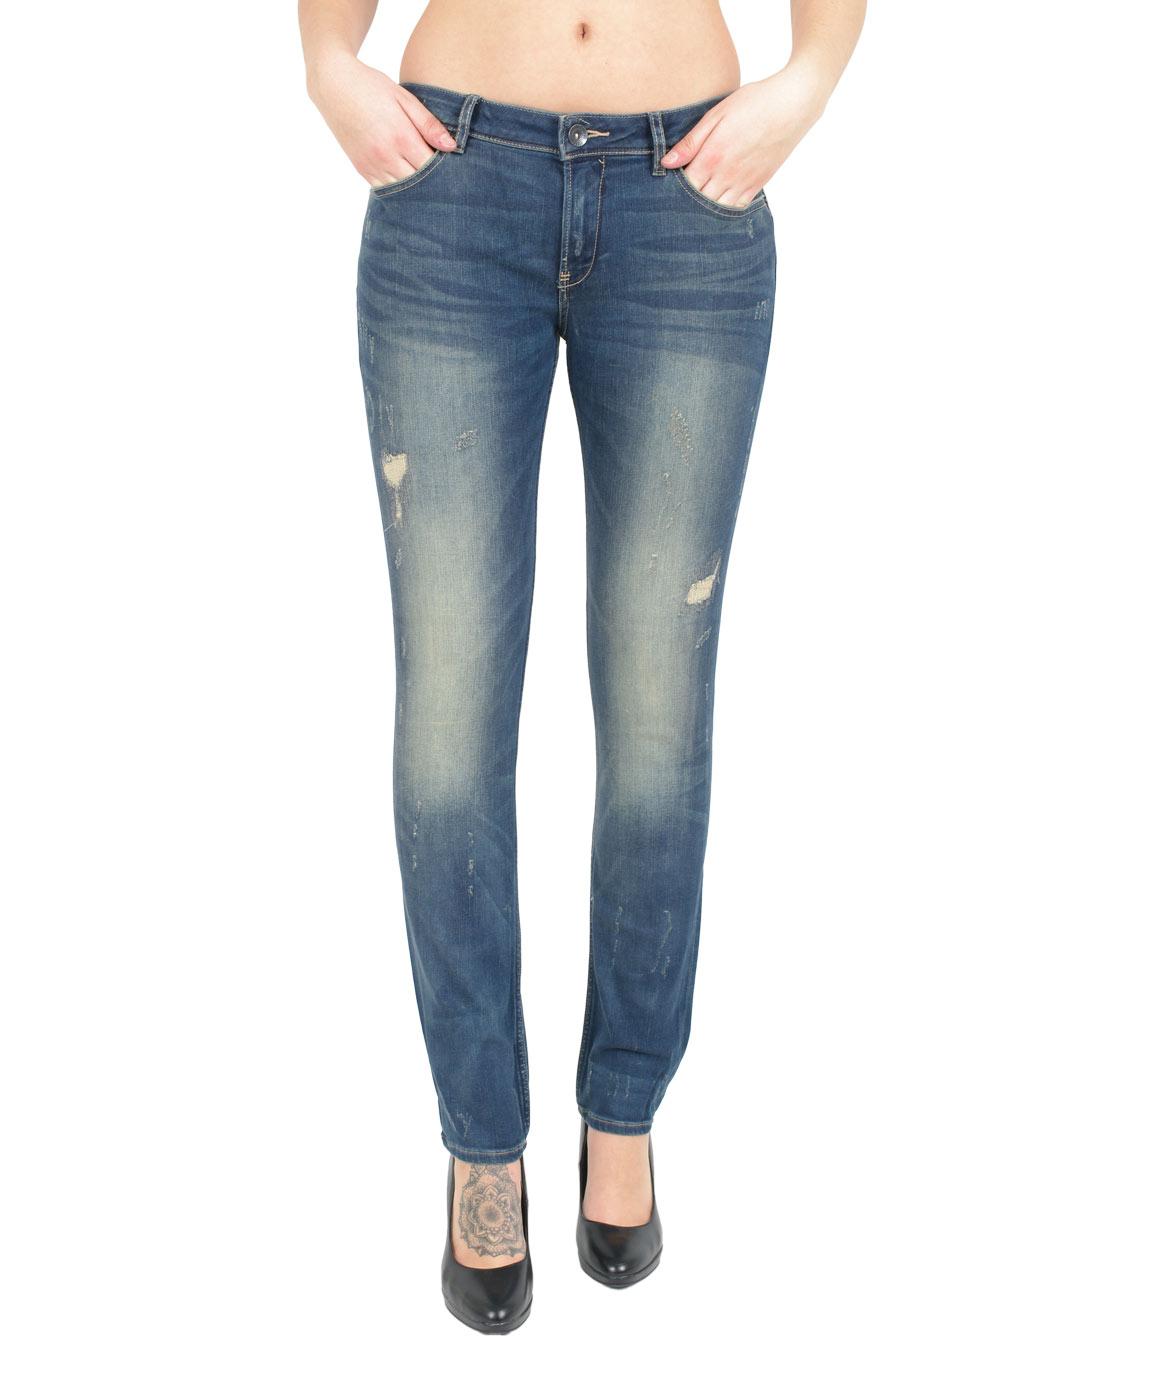 Hosen - Garcia Jeans Röhre Rachelle in Navy Vintage  - Onlineshop Jeans Meile